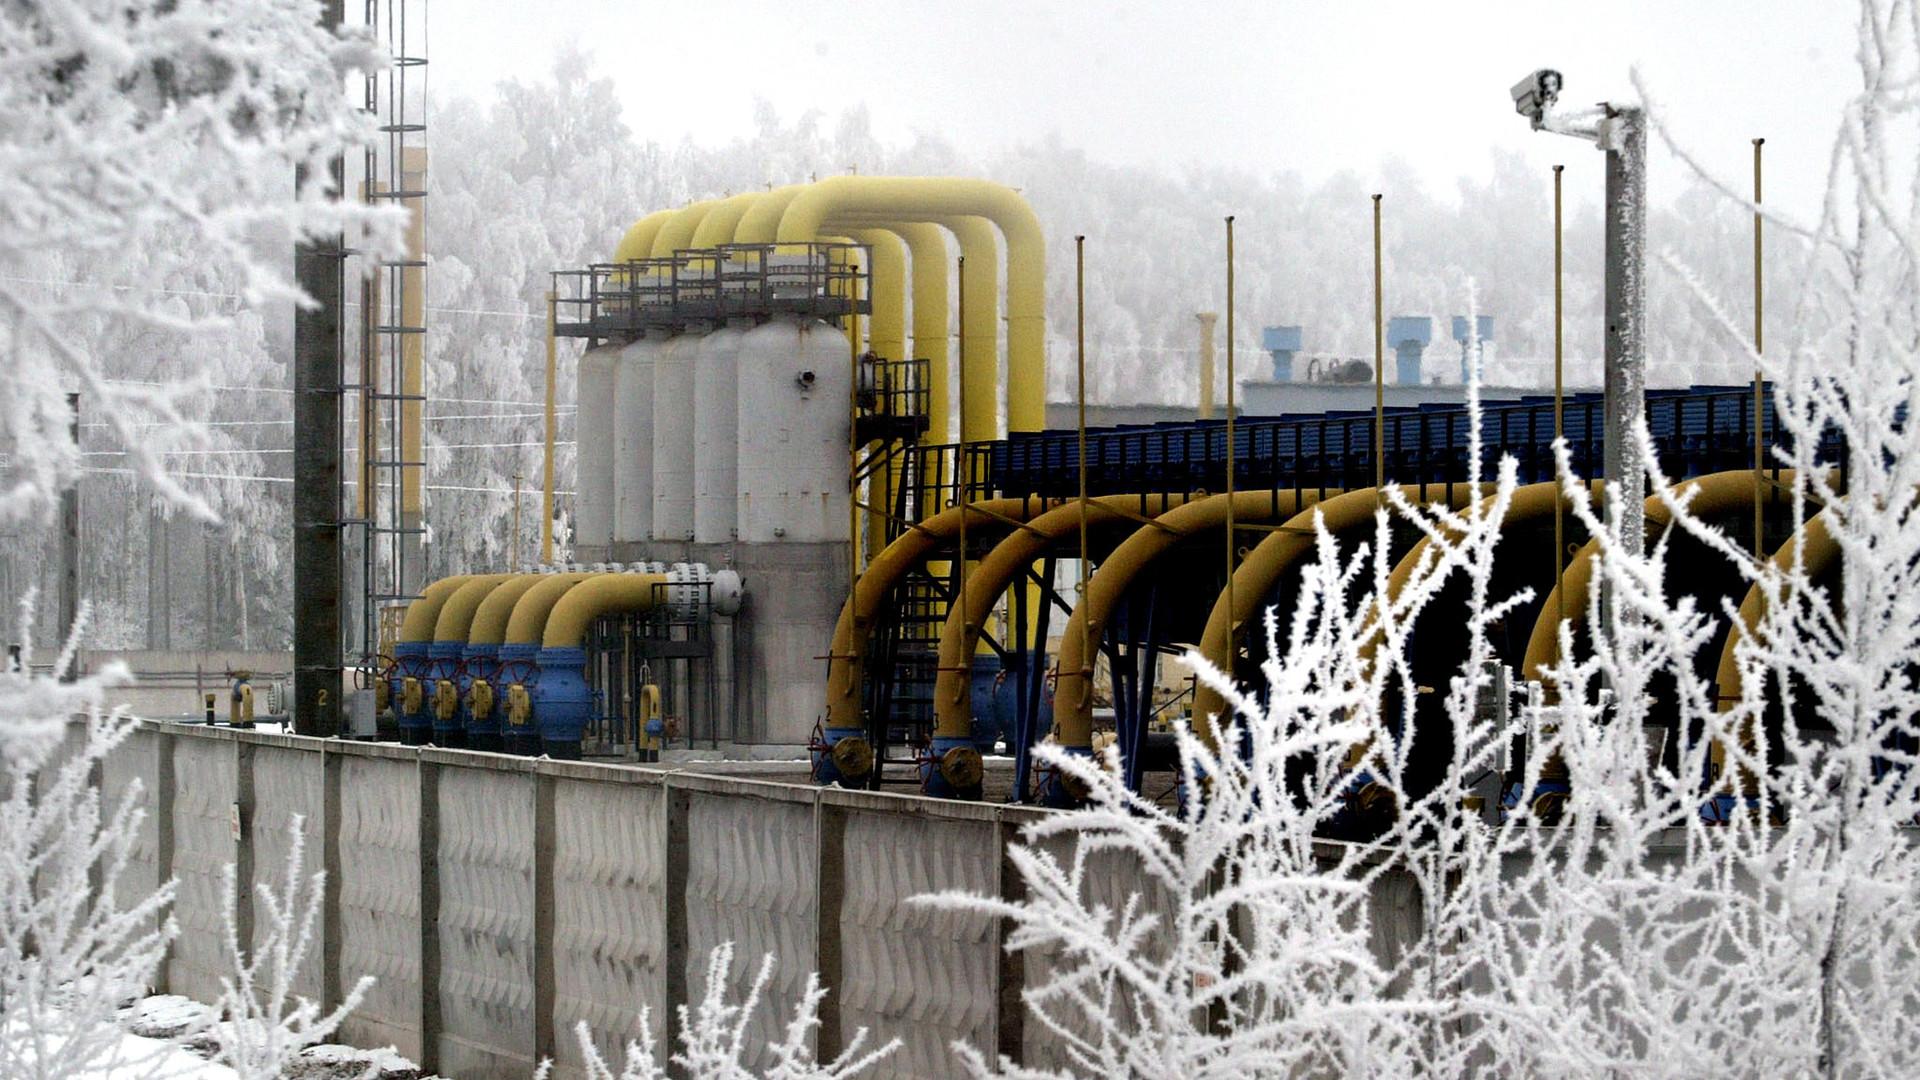 Труба зовёт Европу: останется ли Украина транзитёром российского газа